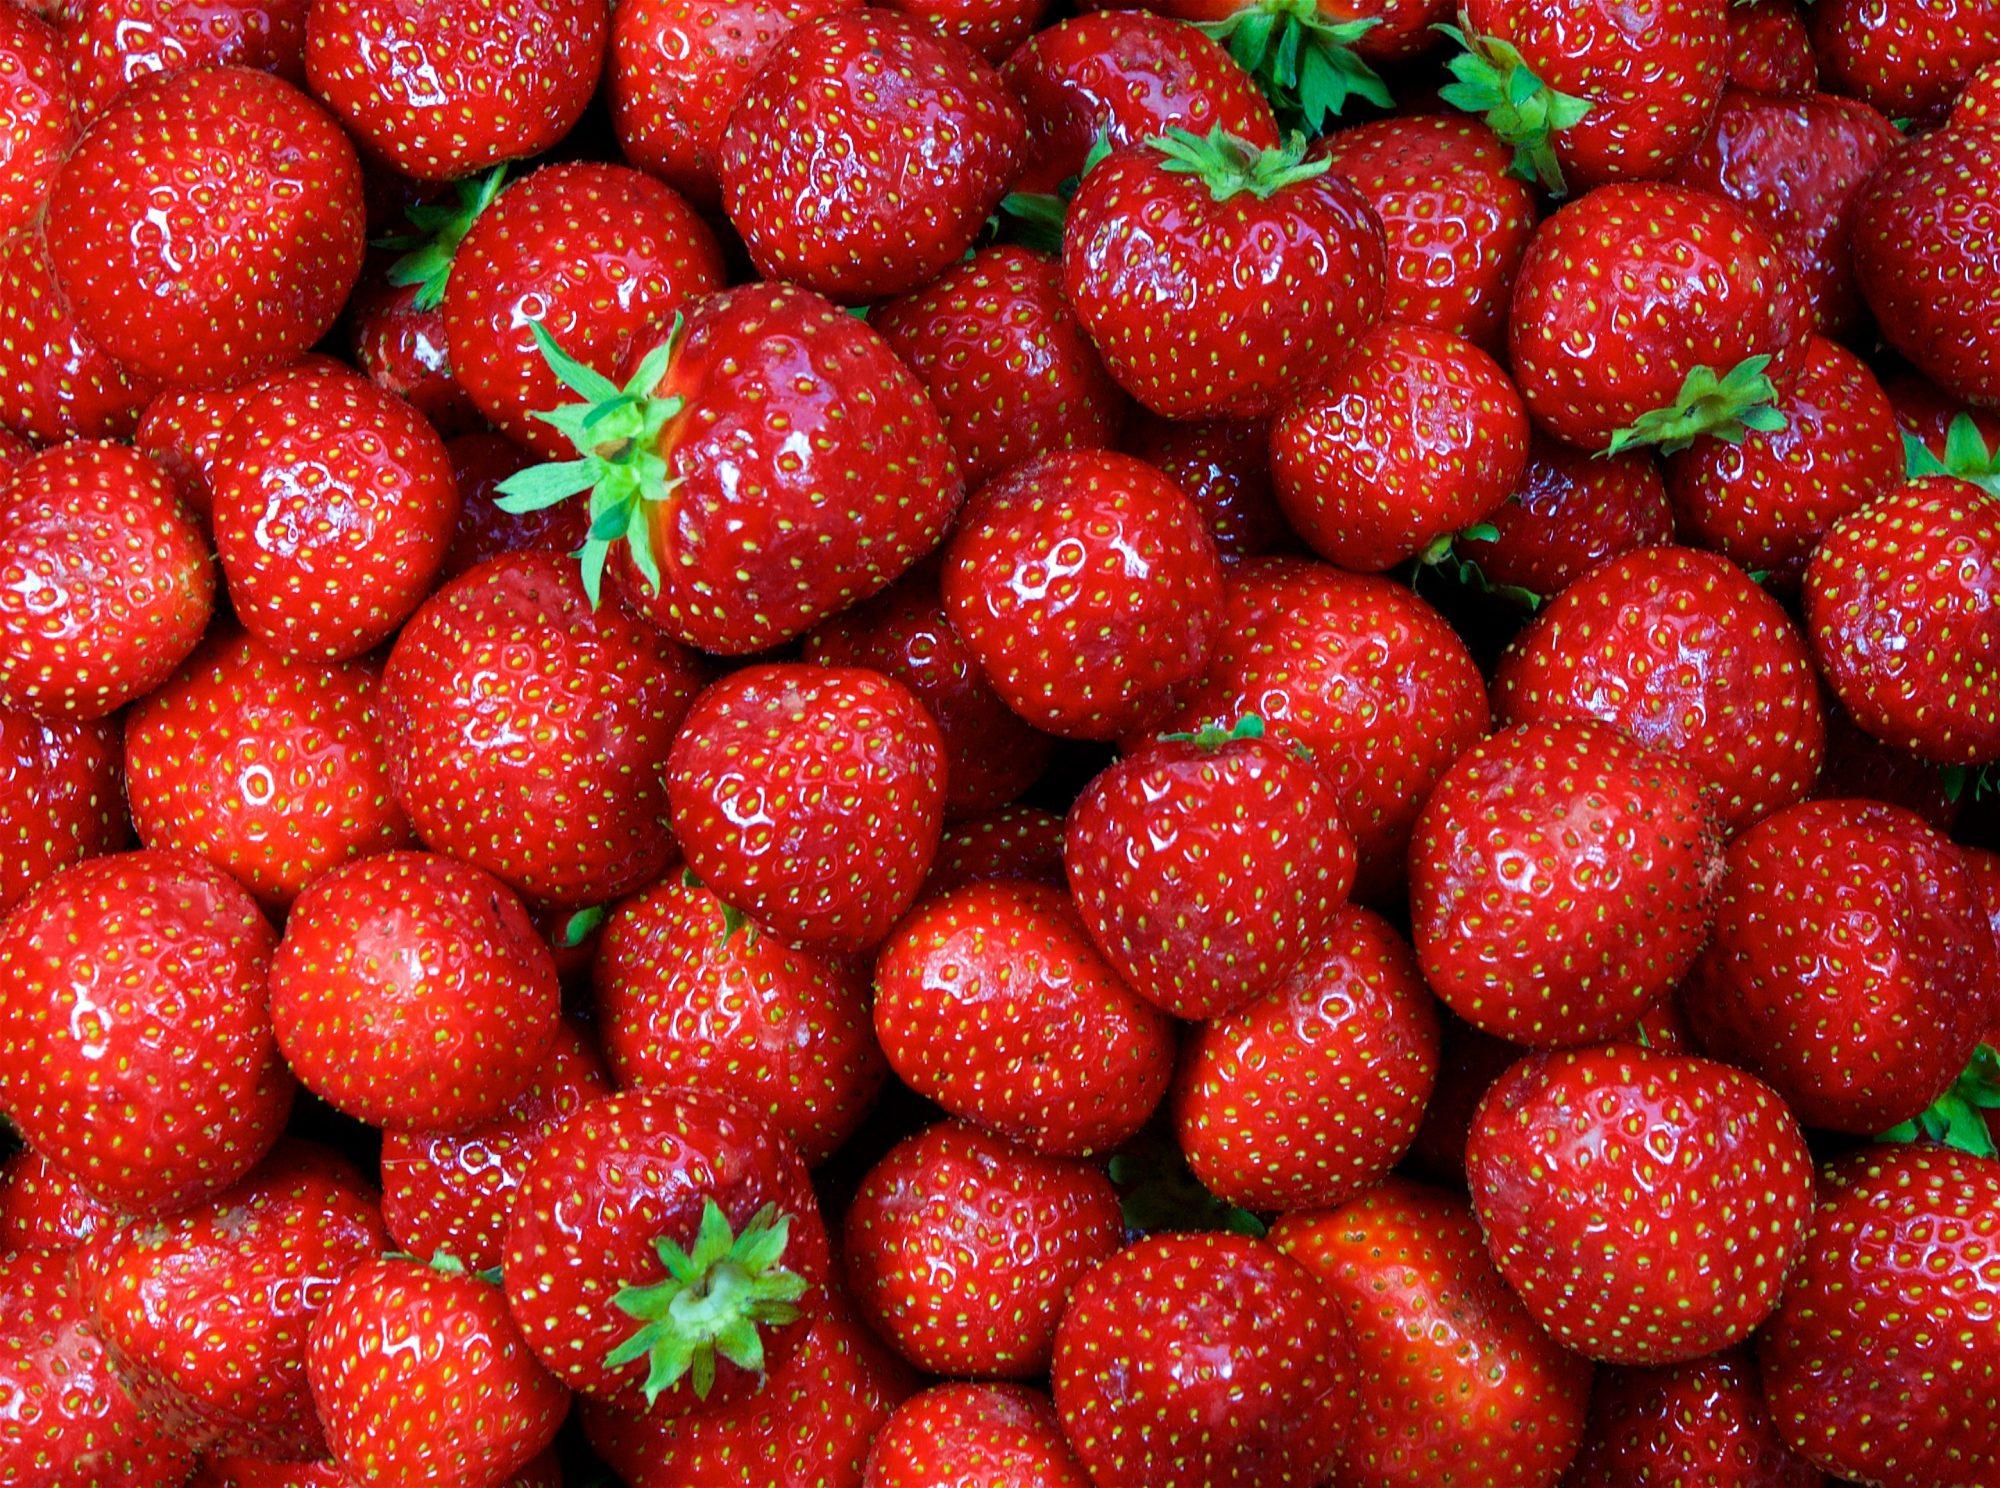 gettystrawberry061419